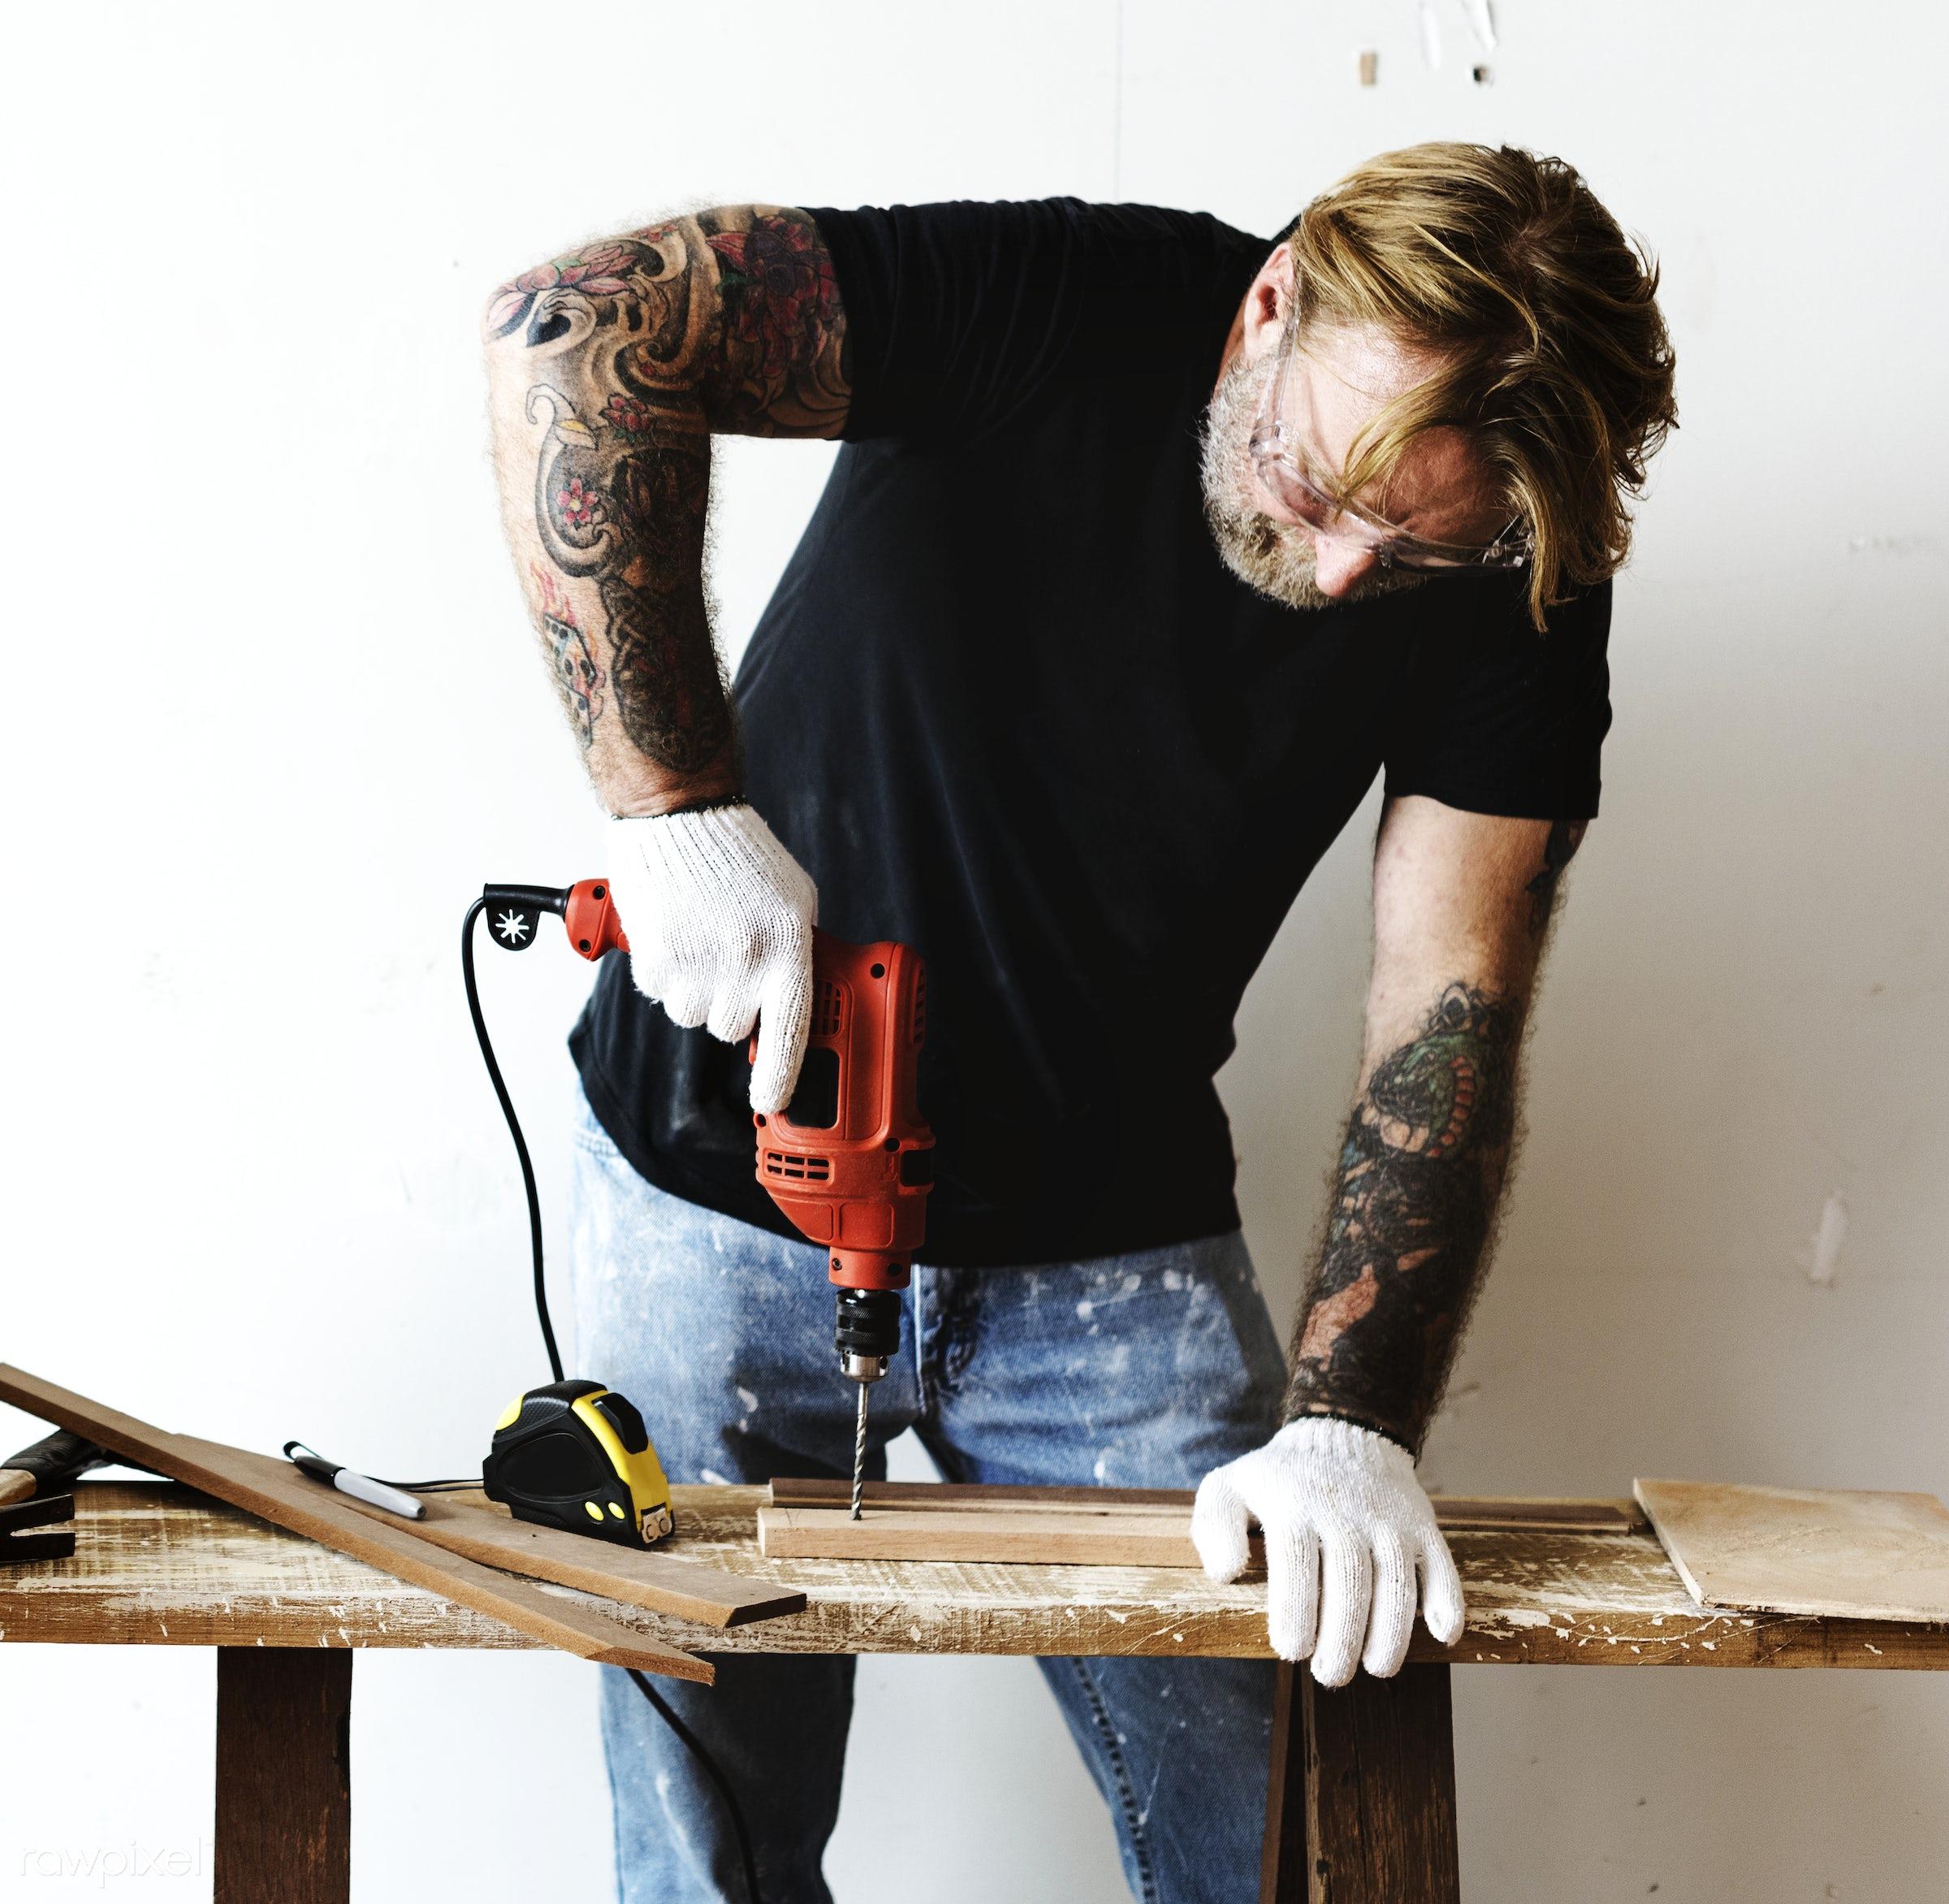 home, technician, development, wood, tool, equipment, house, engineering, installation, repairman, carpenter, handyman,...